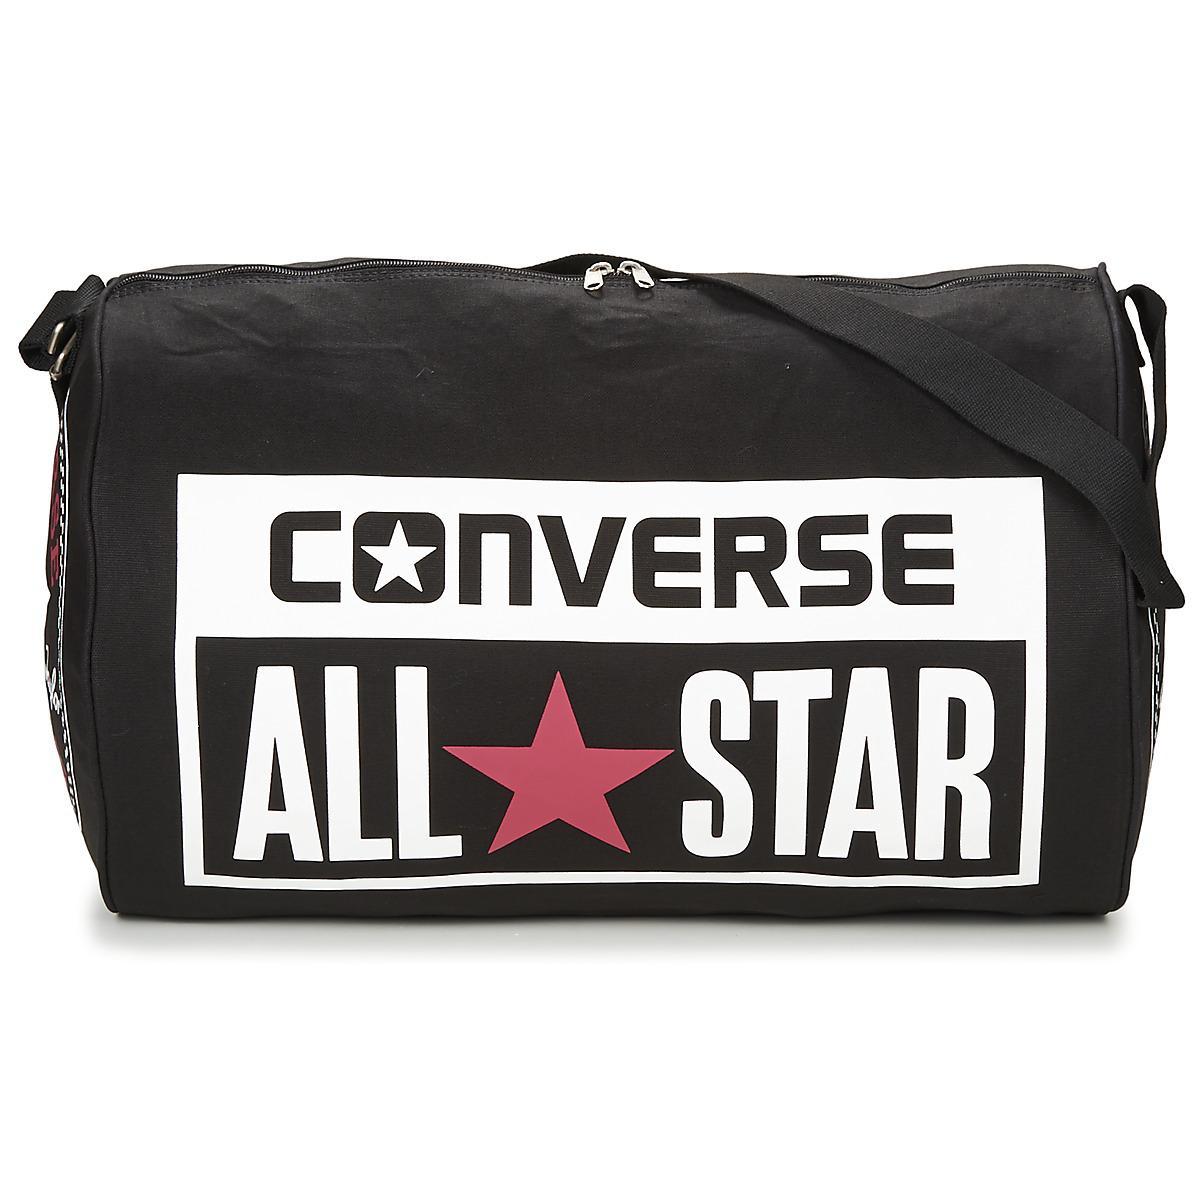 203efdfbd24 Converse Legacy Barrel Duffel Bag Men's Sports Bag In Black in Black ...